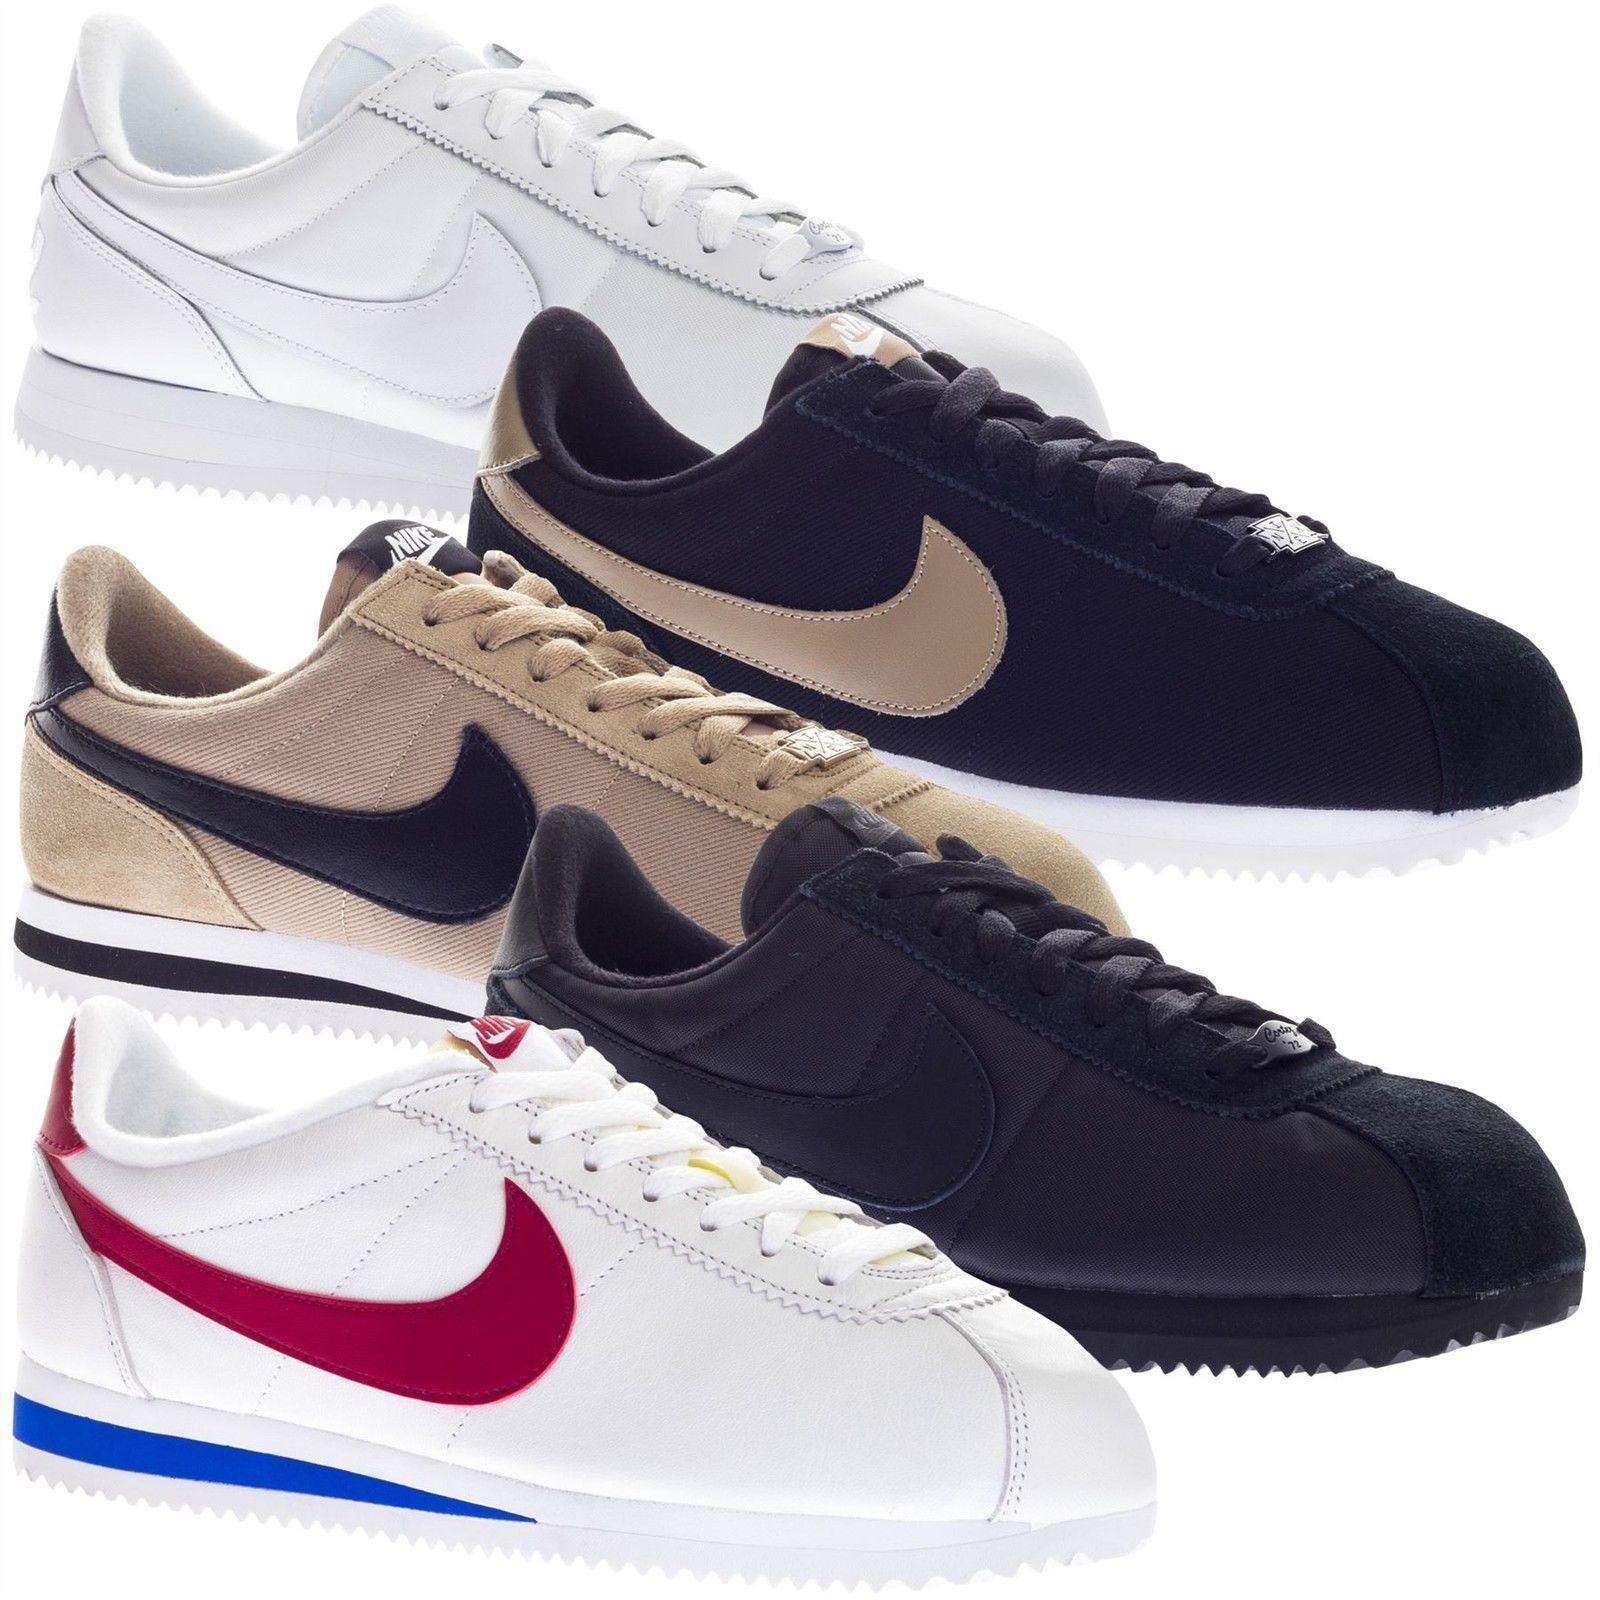 Nike Men's Cortez Classic Prem QS Basso Basic Top Scarpe